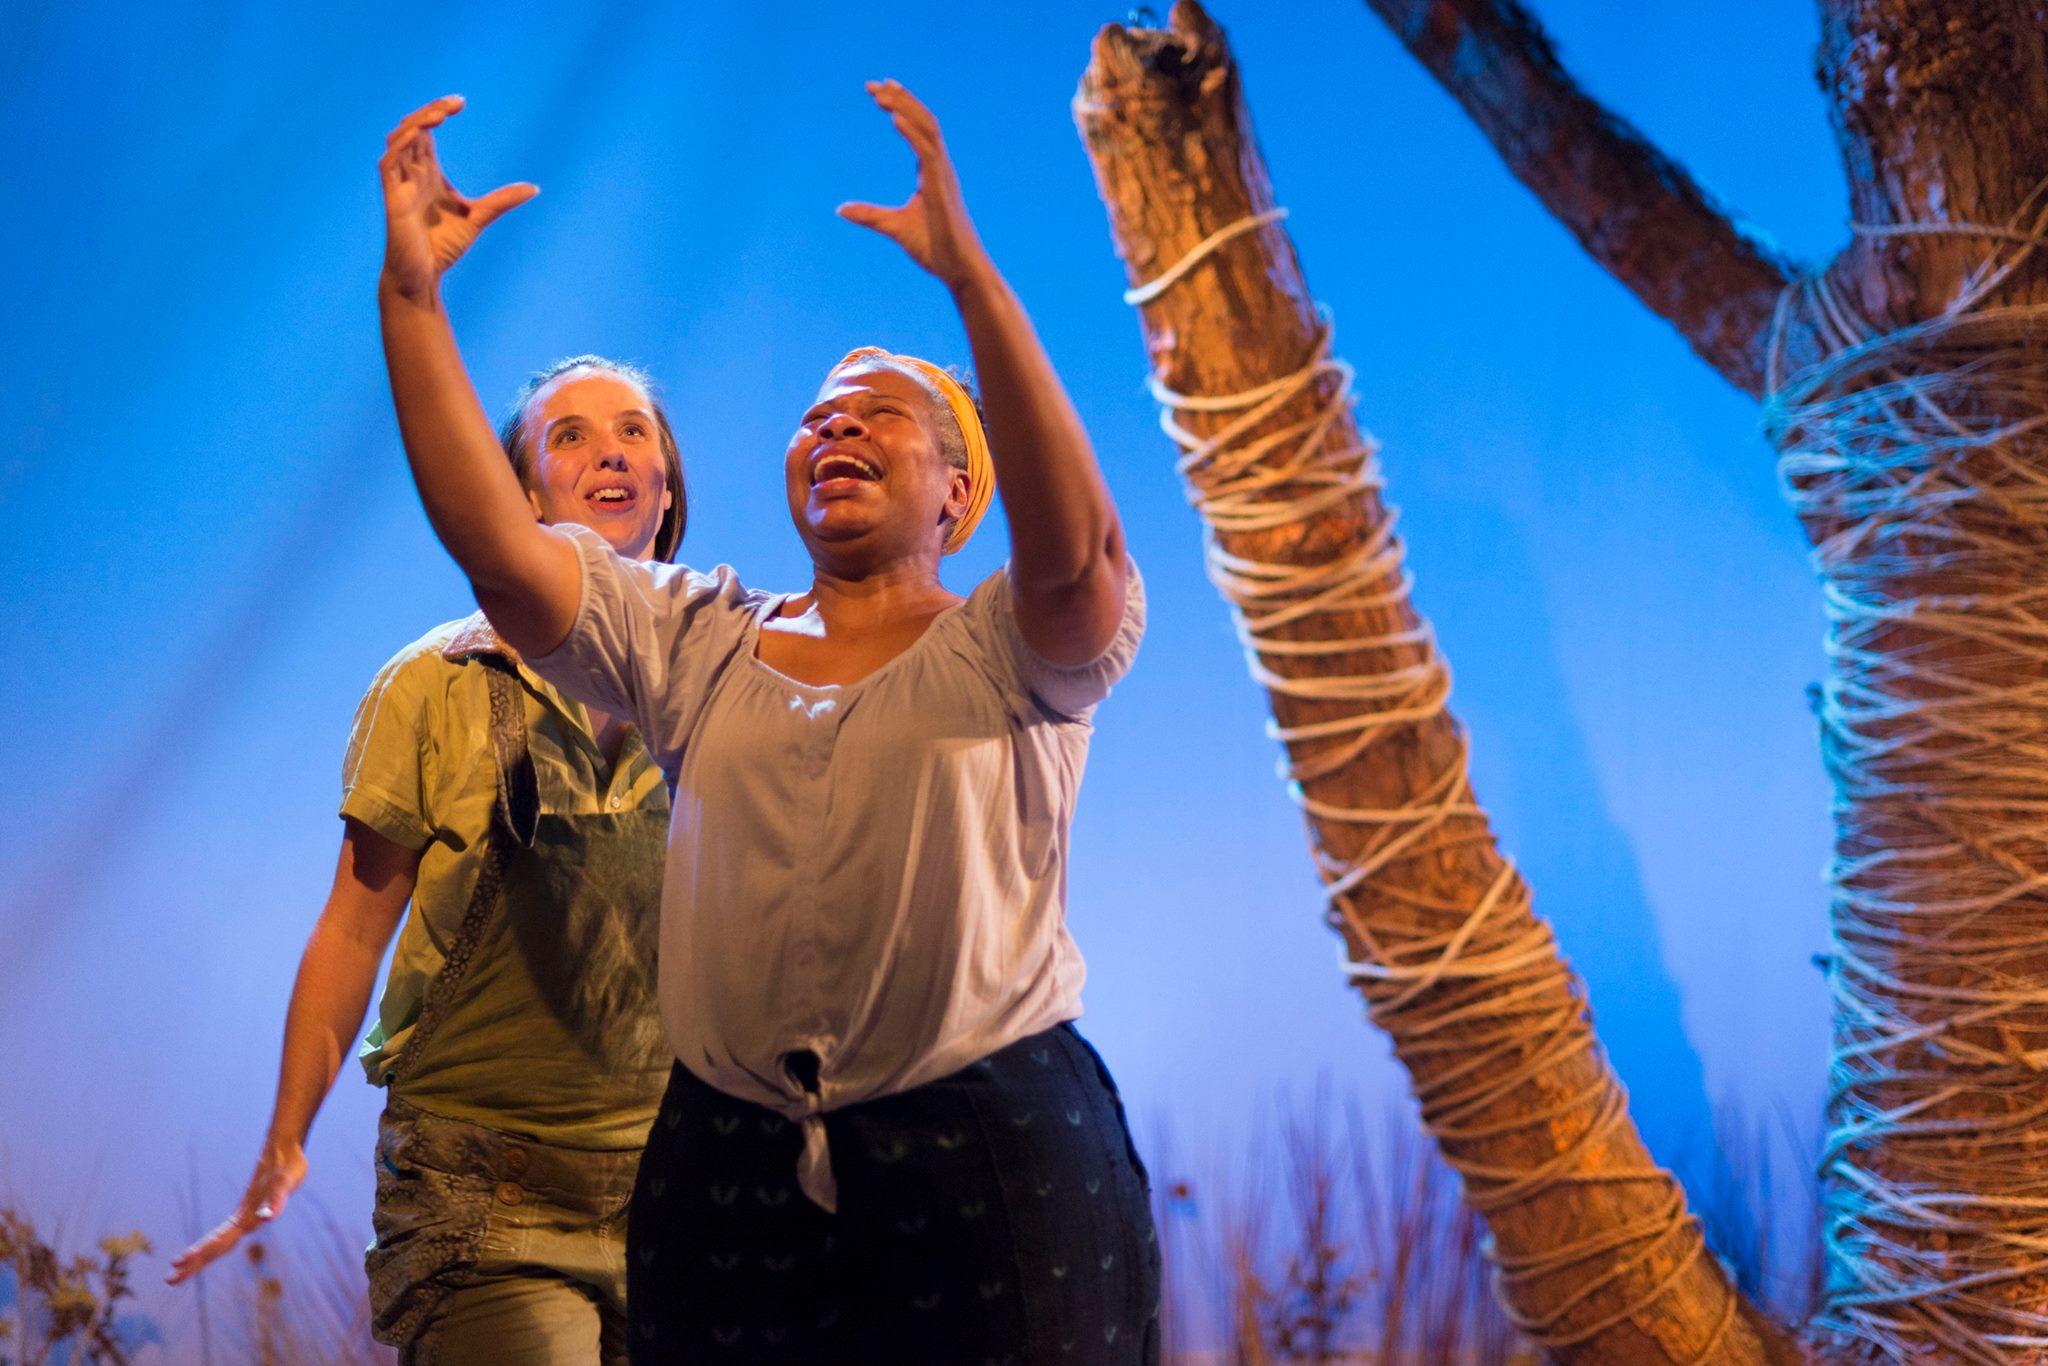 Kristyn Chouiniere and Alice M. Gatling in THE SYRINGA TREE at Theatre Horizon. Photo credit: Matthew J Photography